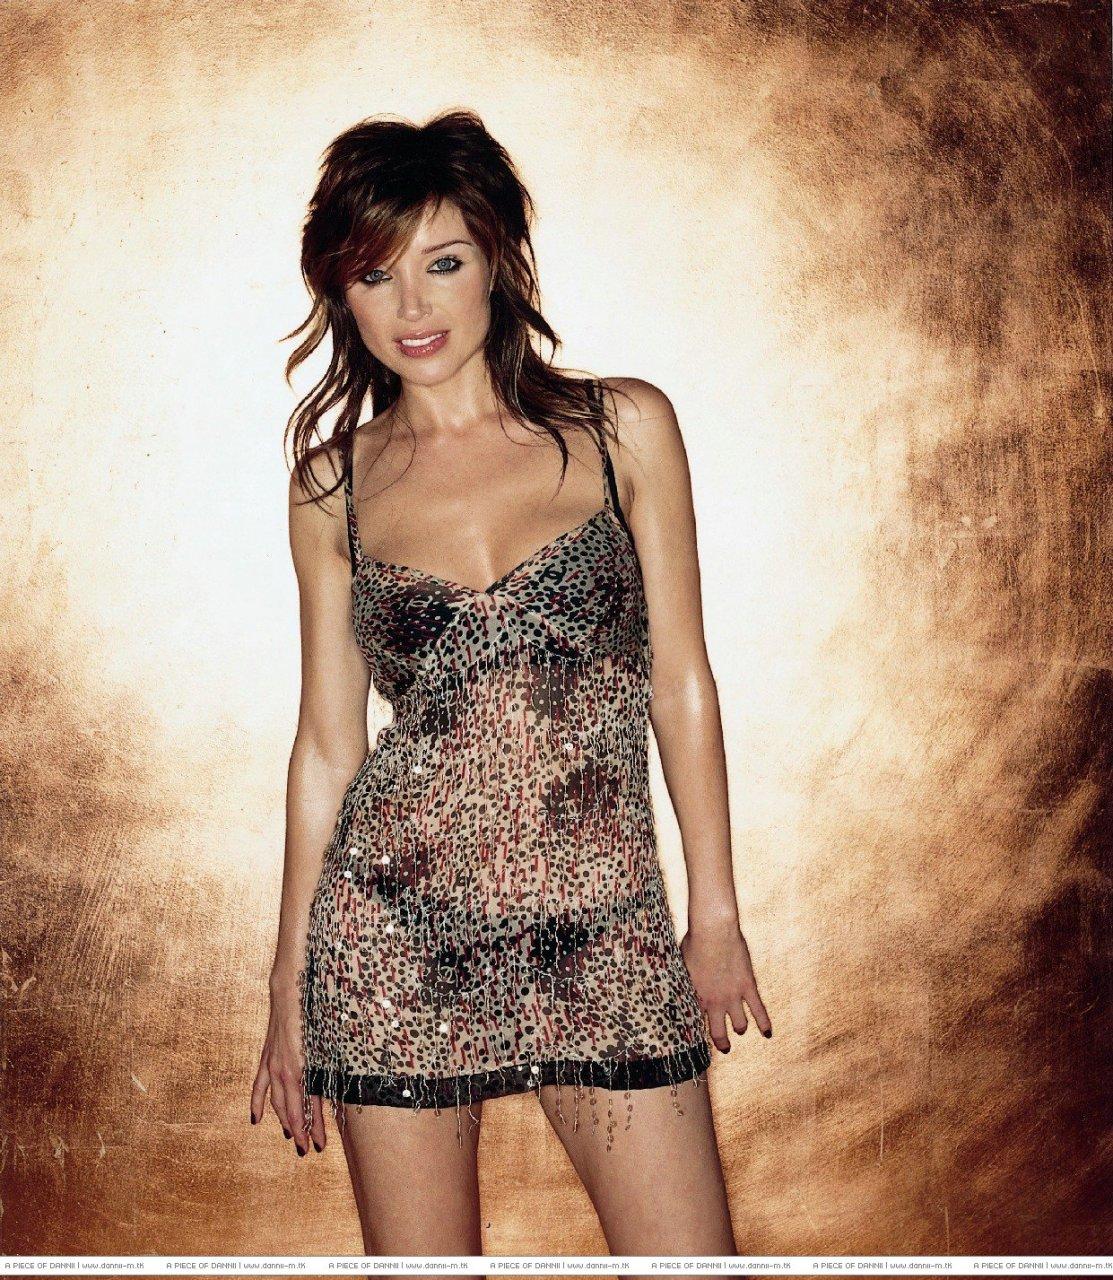 http://2.bp.blogspot.com/-kYCq5QNb7Og/ULUizAbUfvI/AAAAAAAASB4/HR95U5Dtbrs/s1600/Dannii_Minogue23.jpg